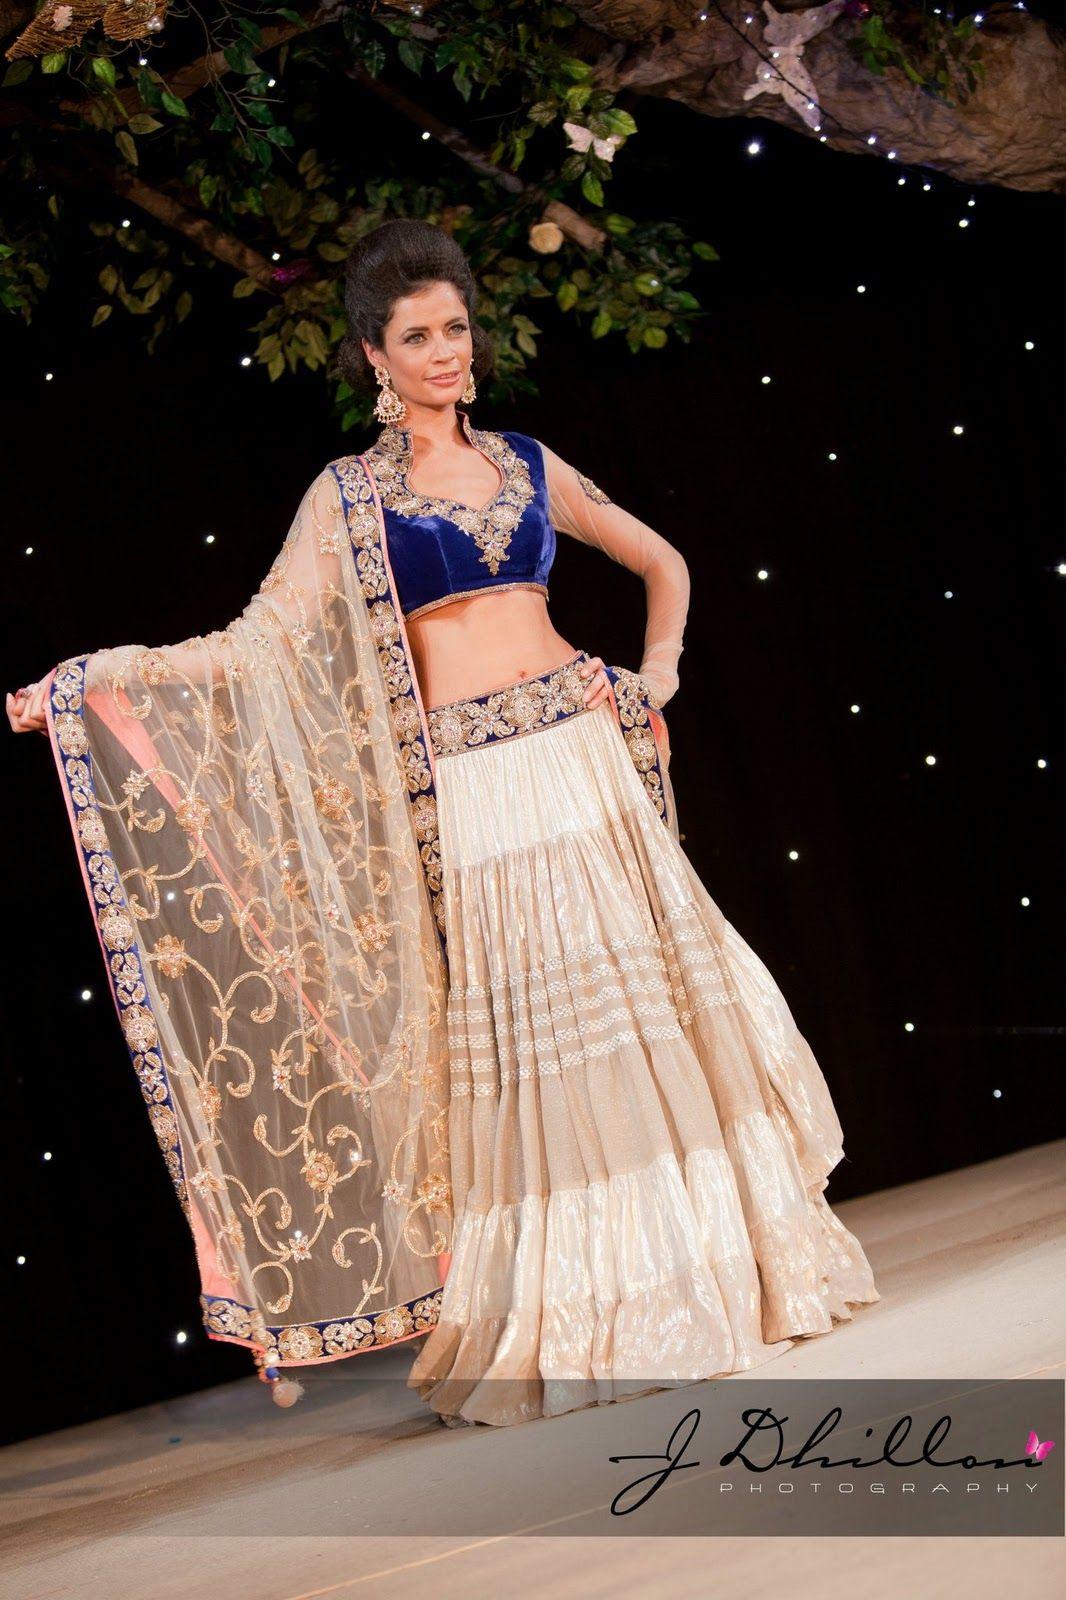 Asiana-Bridal-Show | The dulhan diaries | Pinterest